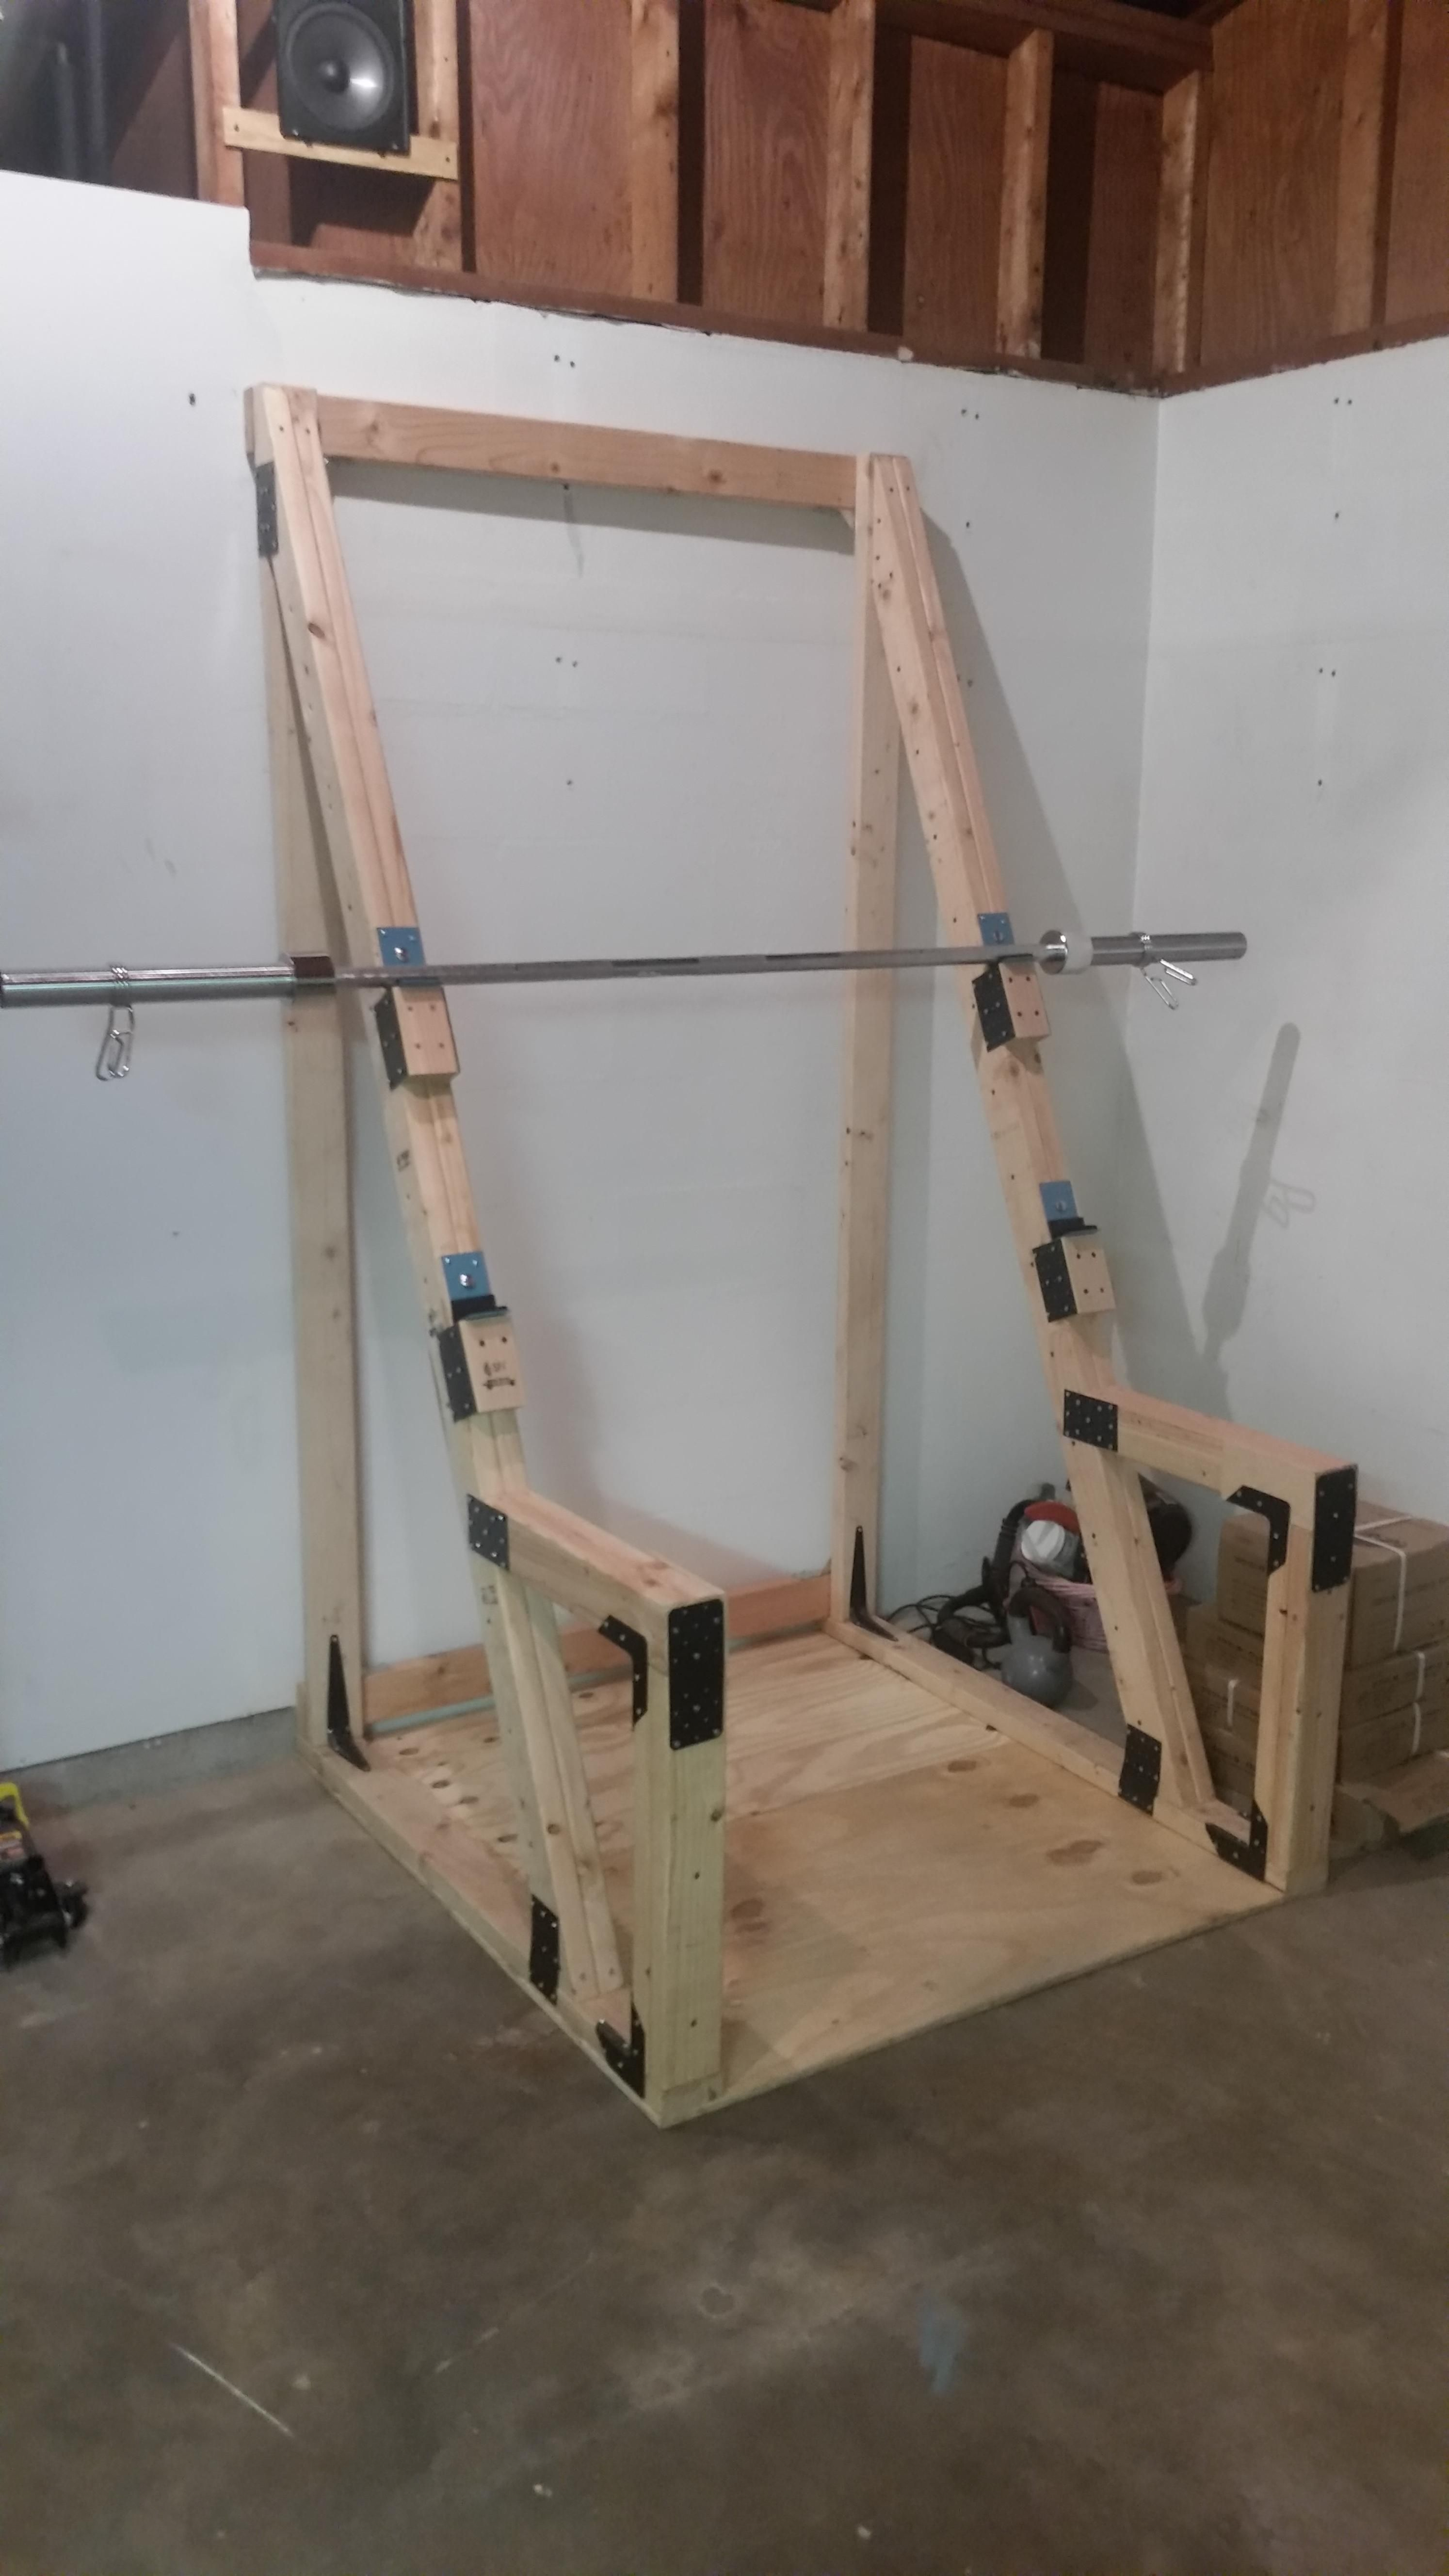 DIY Squat Rack Diy home gym, Gym room at home, Squat